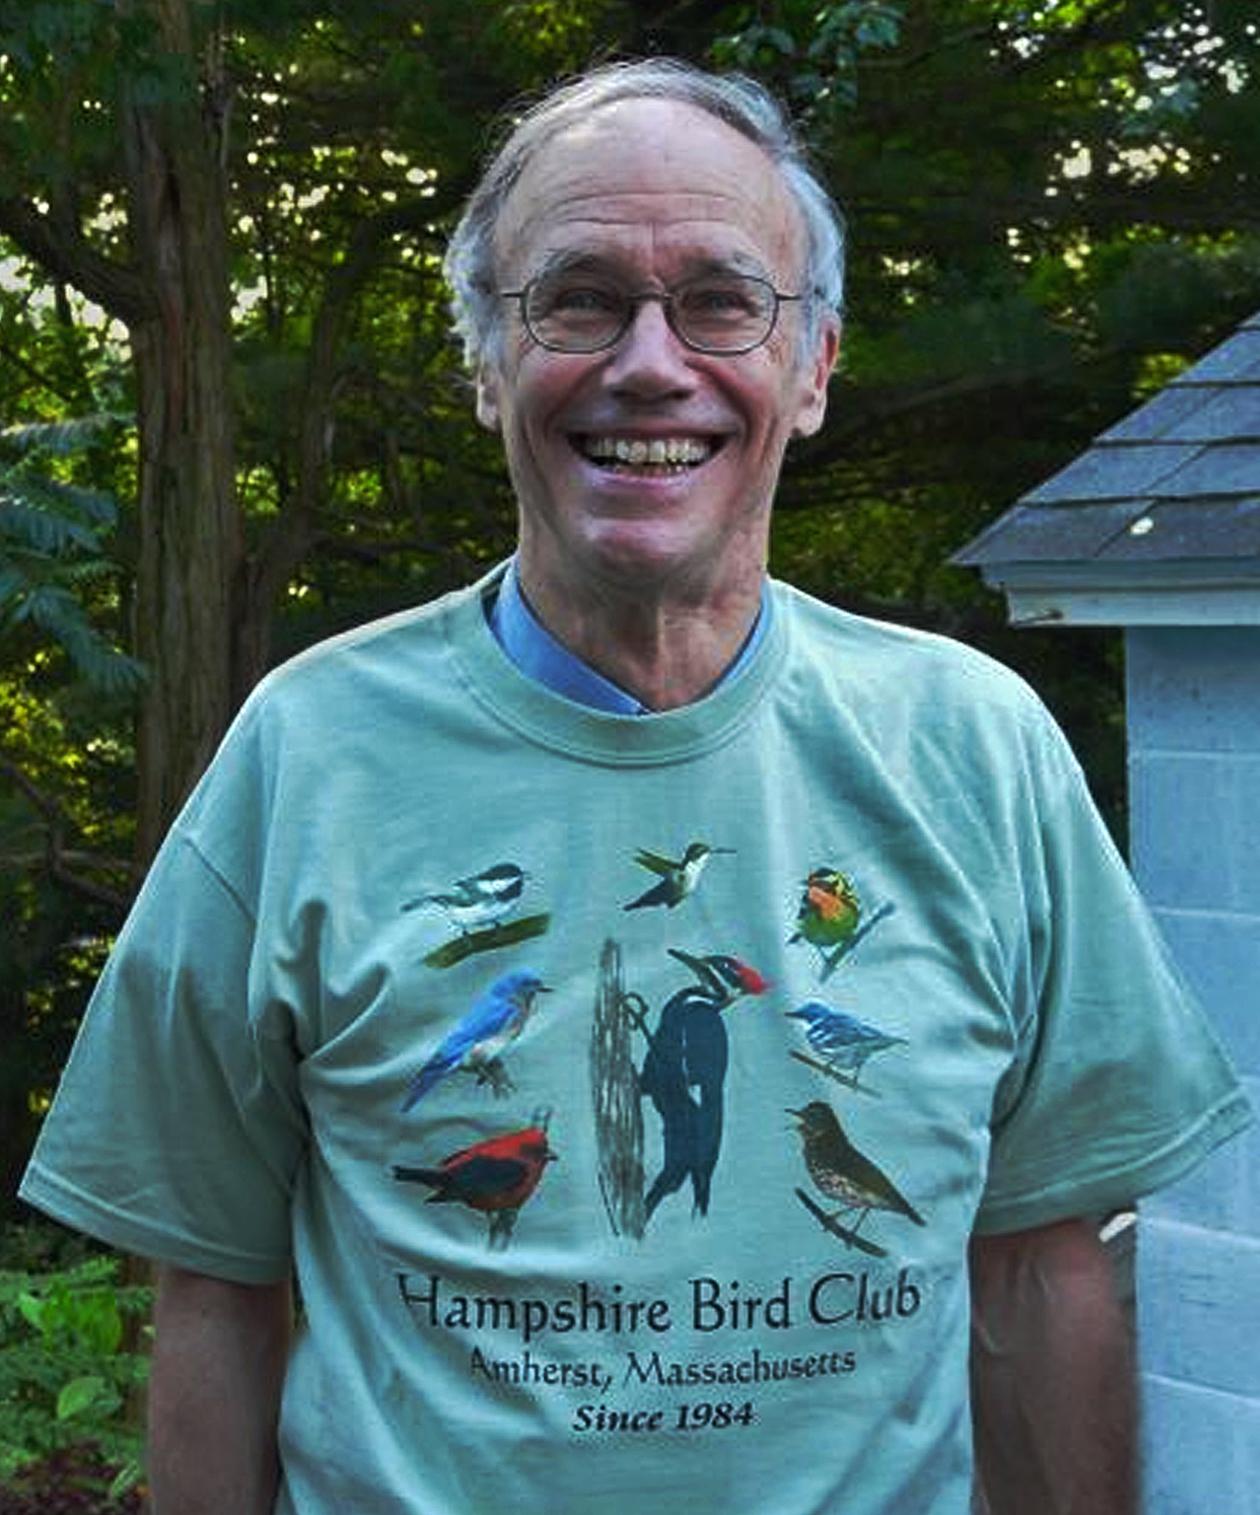 John Van de Graaff wearing Hampshire Bird Club's T-shirt featuring his bird images